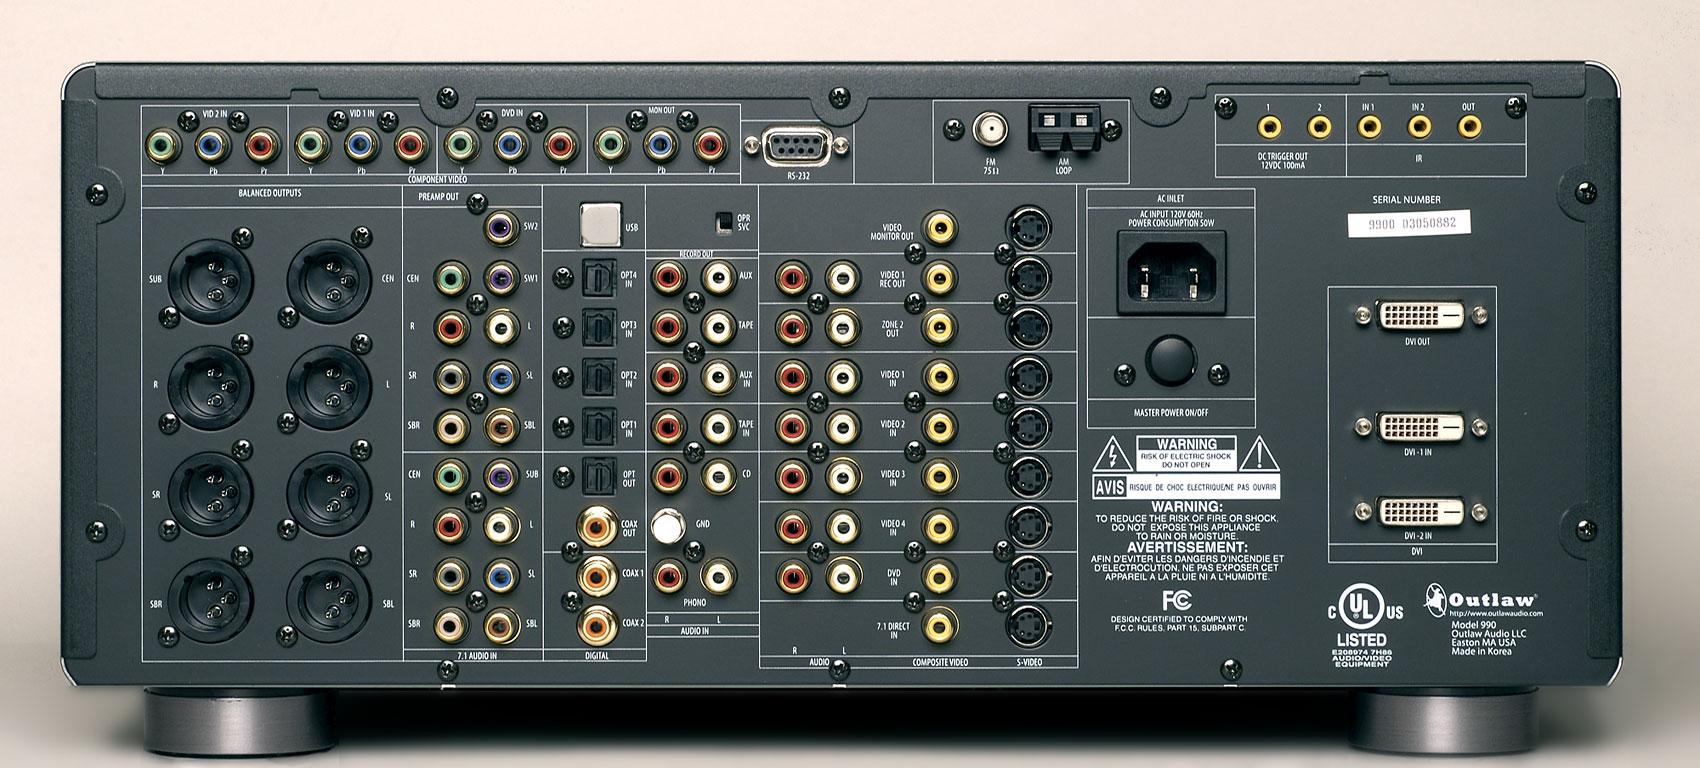 990-back-huge.jpg